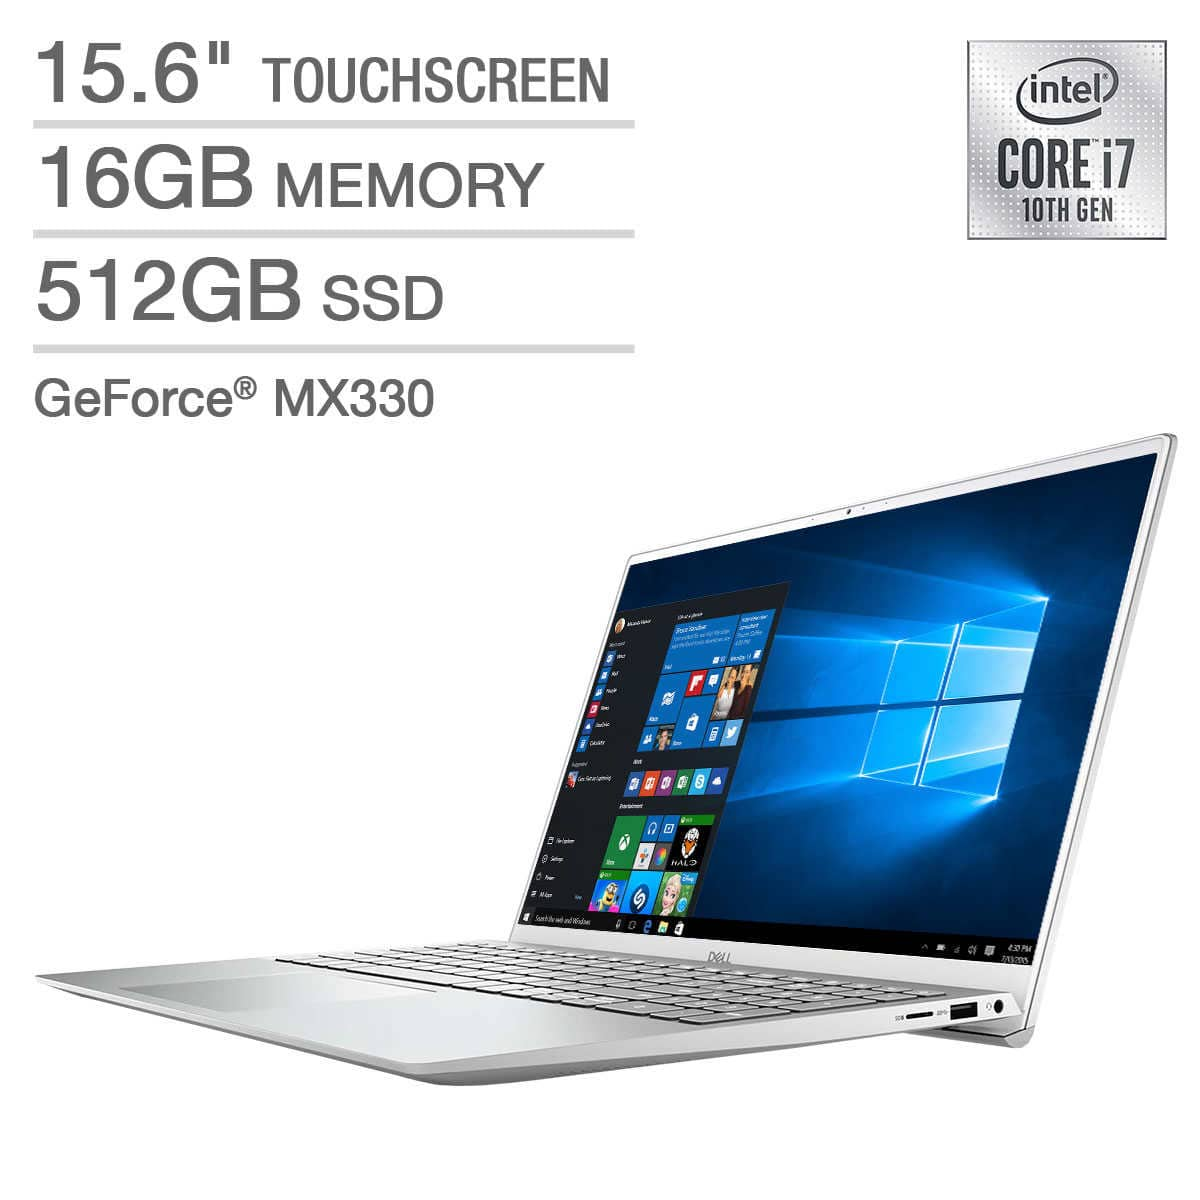 "Dell Inspiron 15"" 5000 Series Touchscreen Laptop - 10th Gen Intel Core i7-1065G7 - GeForce MX330- 1080p $799.99"